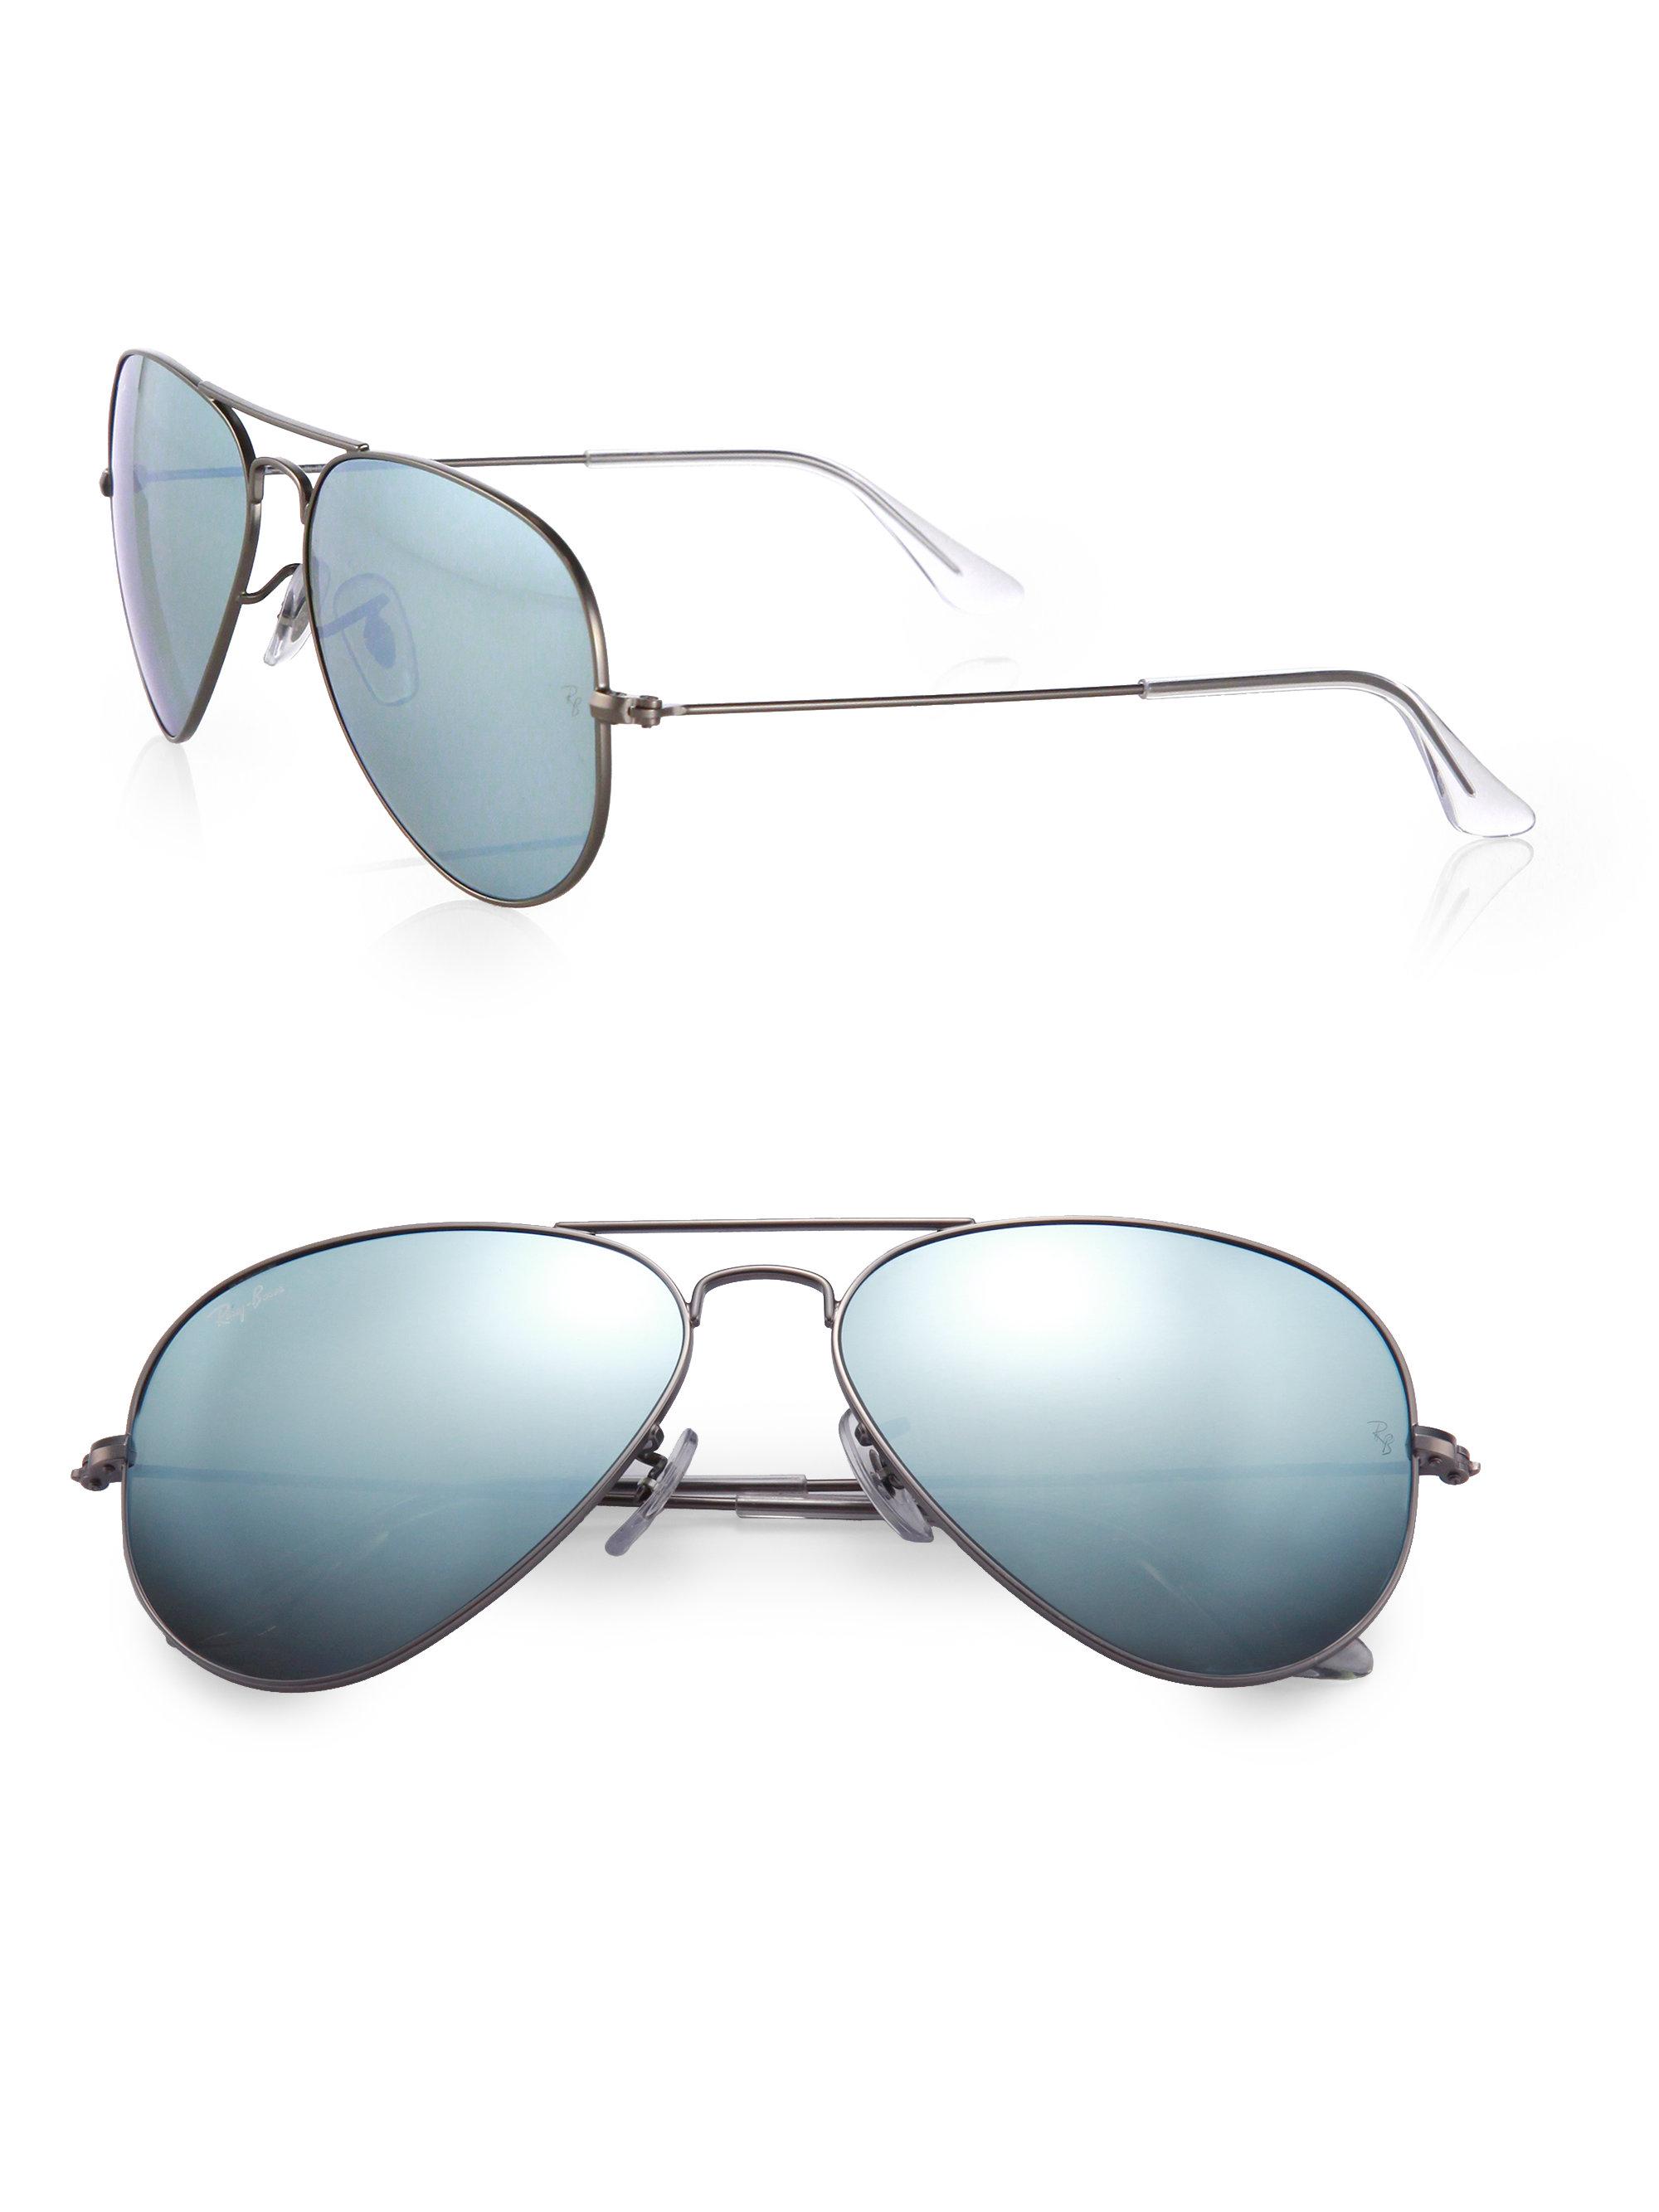 849abd3f76b3 Ray Ban Matte Blue Metal Classic Aviator Sunglasses « Heritage Malta